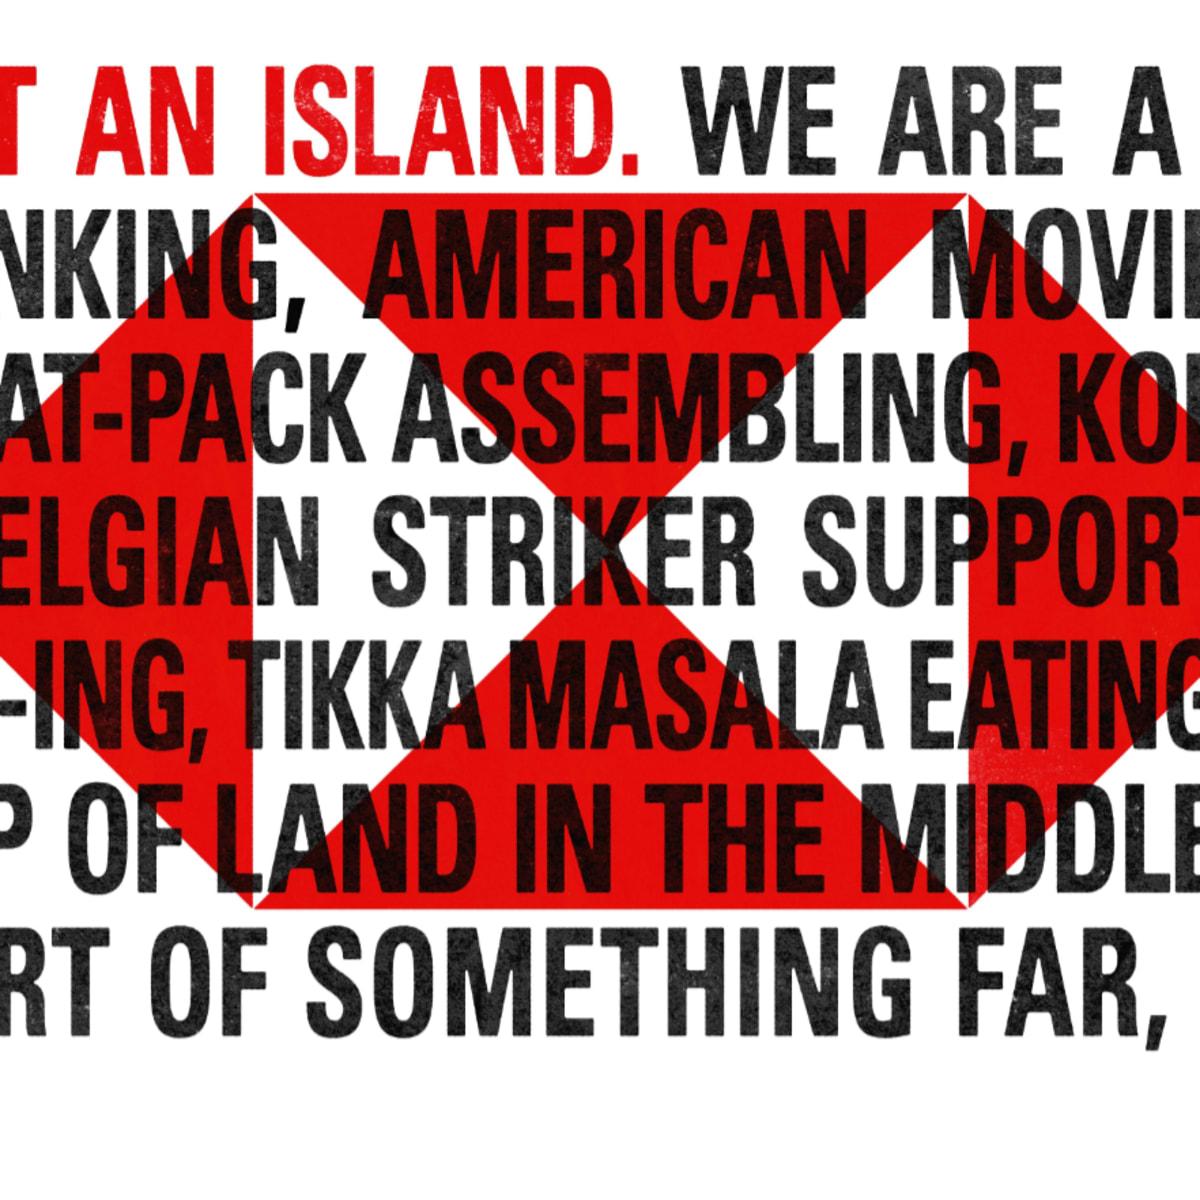 London HSBC We Are Not An Island Hero